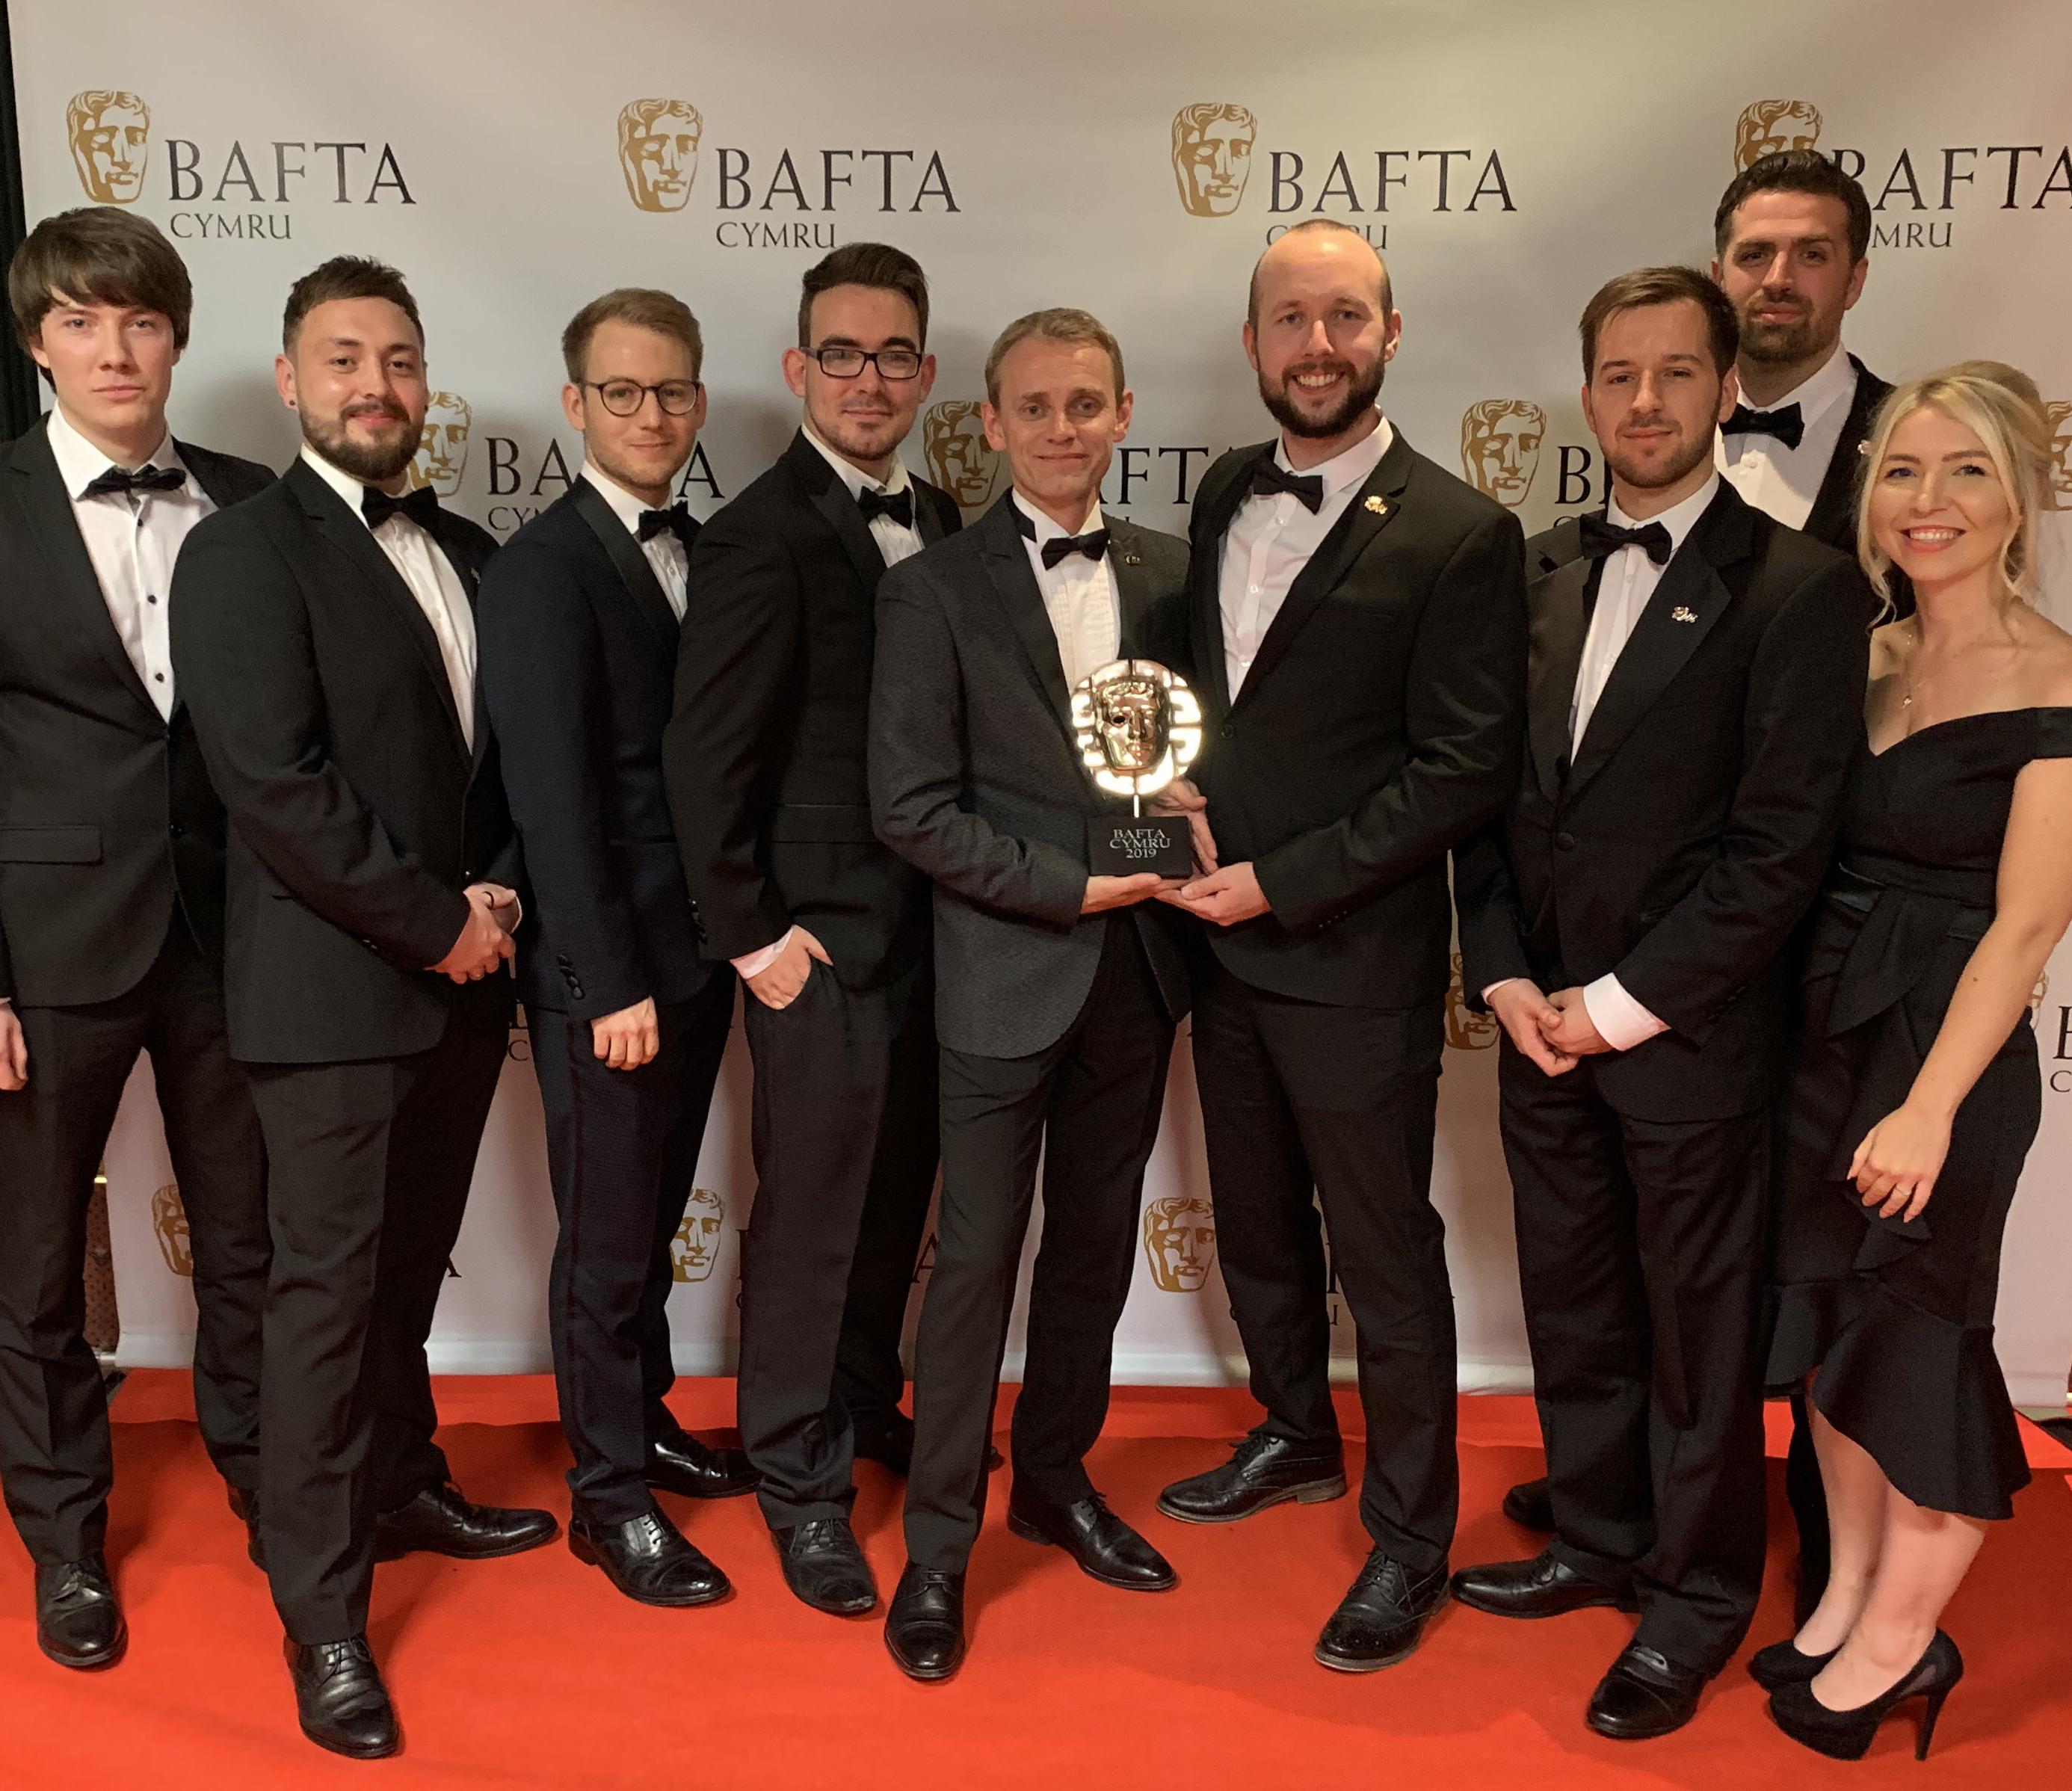 BAFTA_Cymru_Winner_2019_Wales_Interactiv